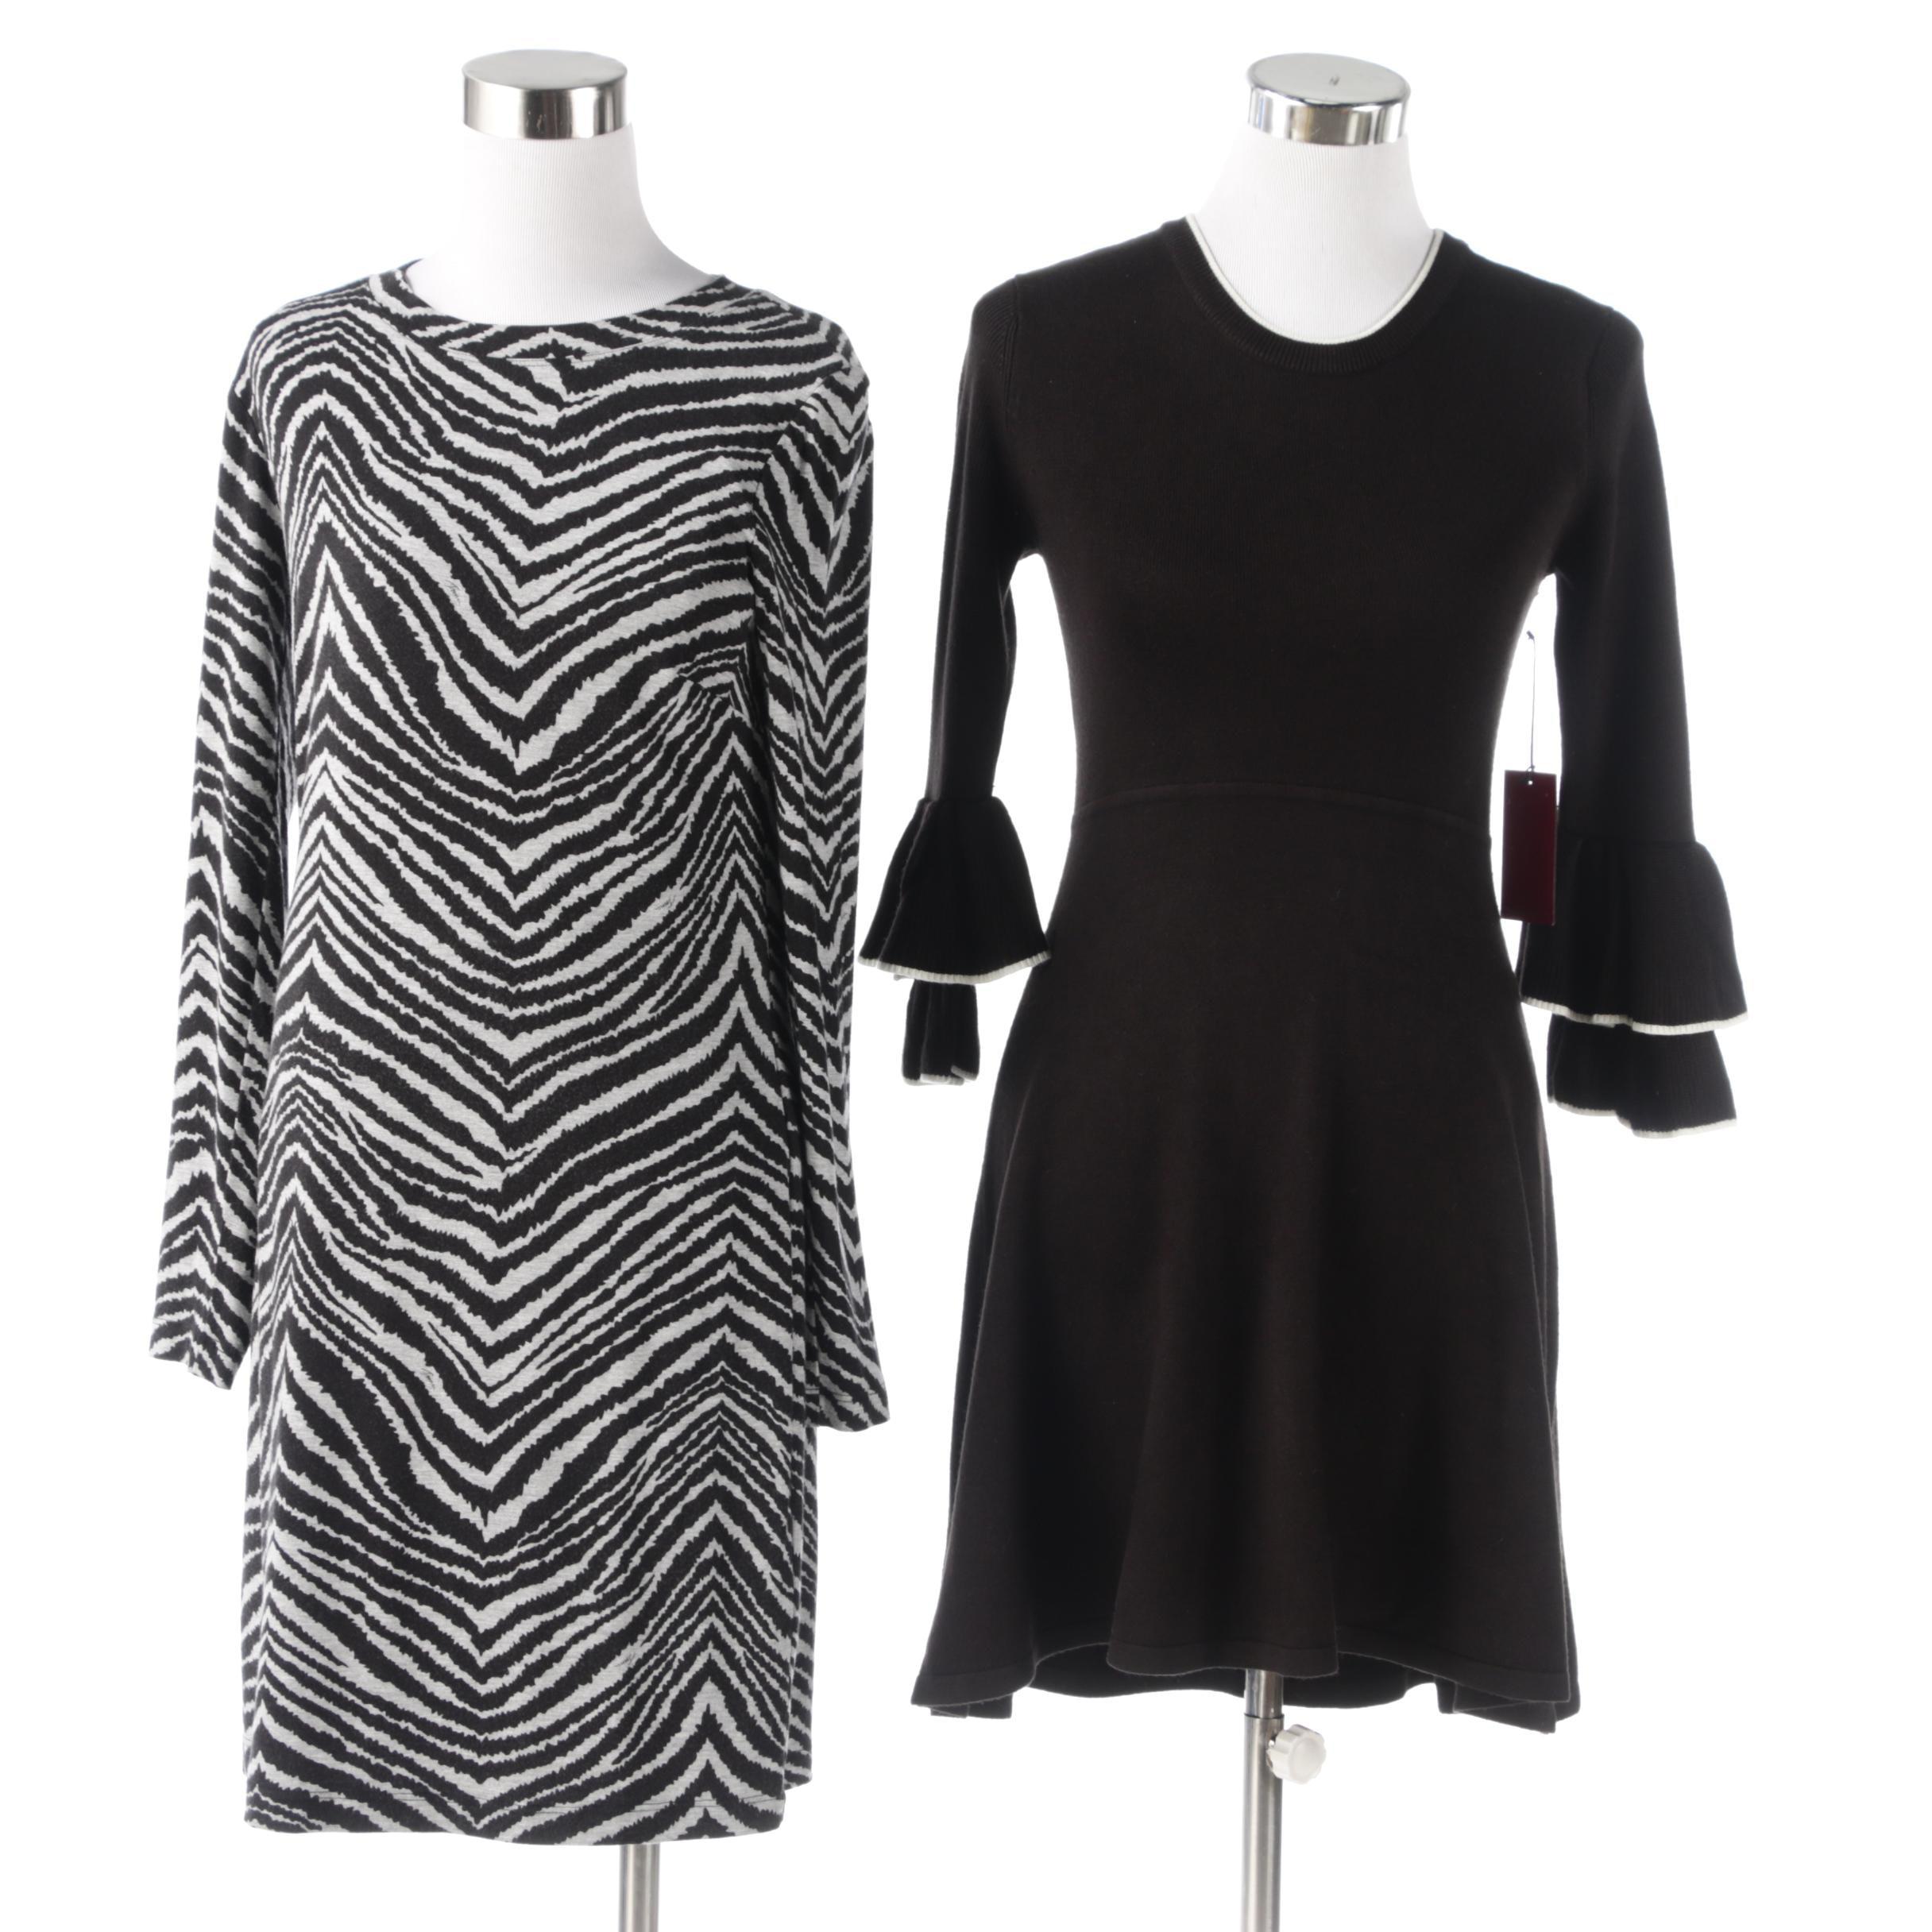 Trina Turk Animal Print Dress with Vince Camuto Ruffle Sleeve Sweater Dress